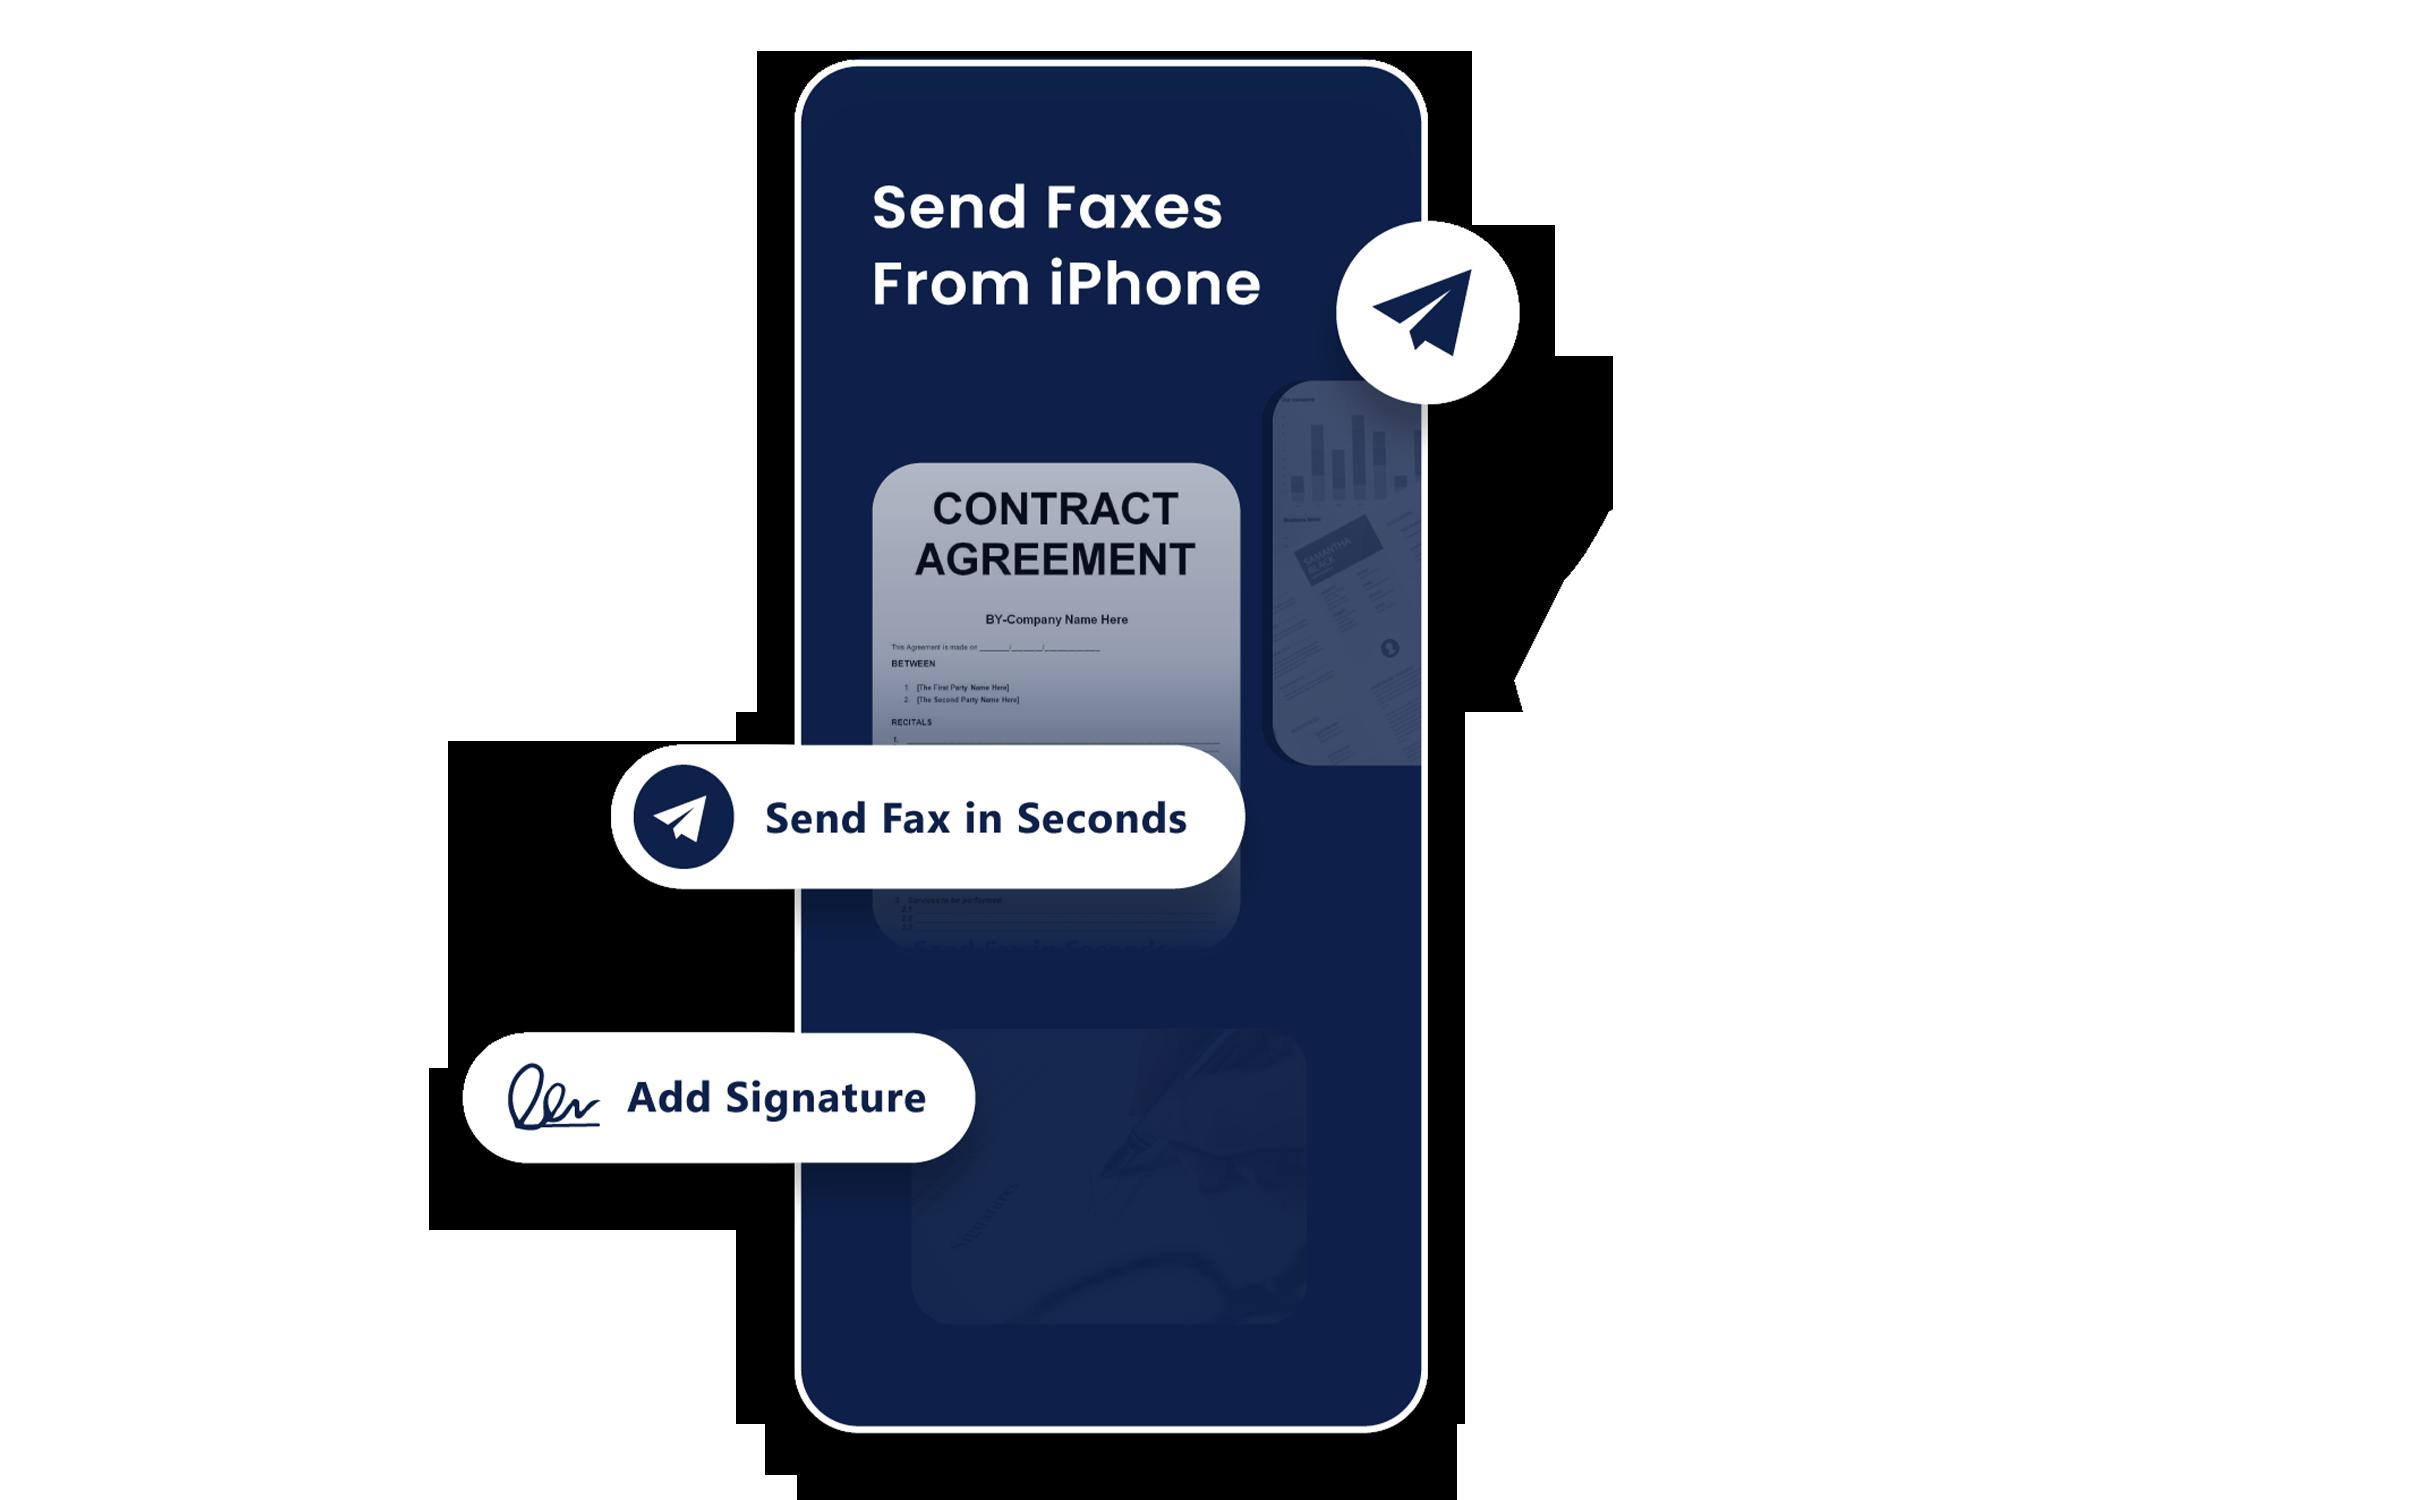 Best Fax Sending App for iPhone